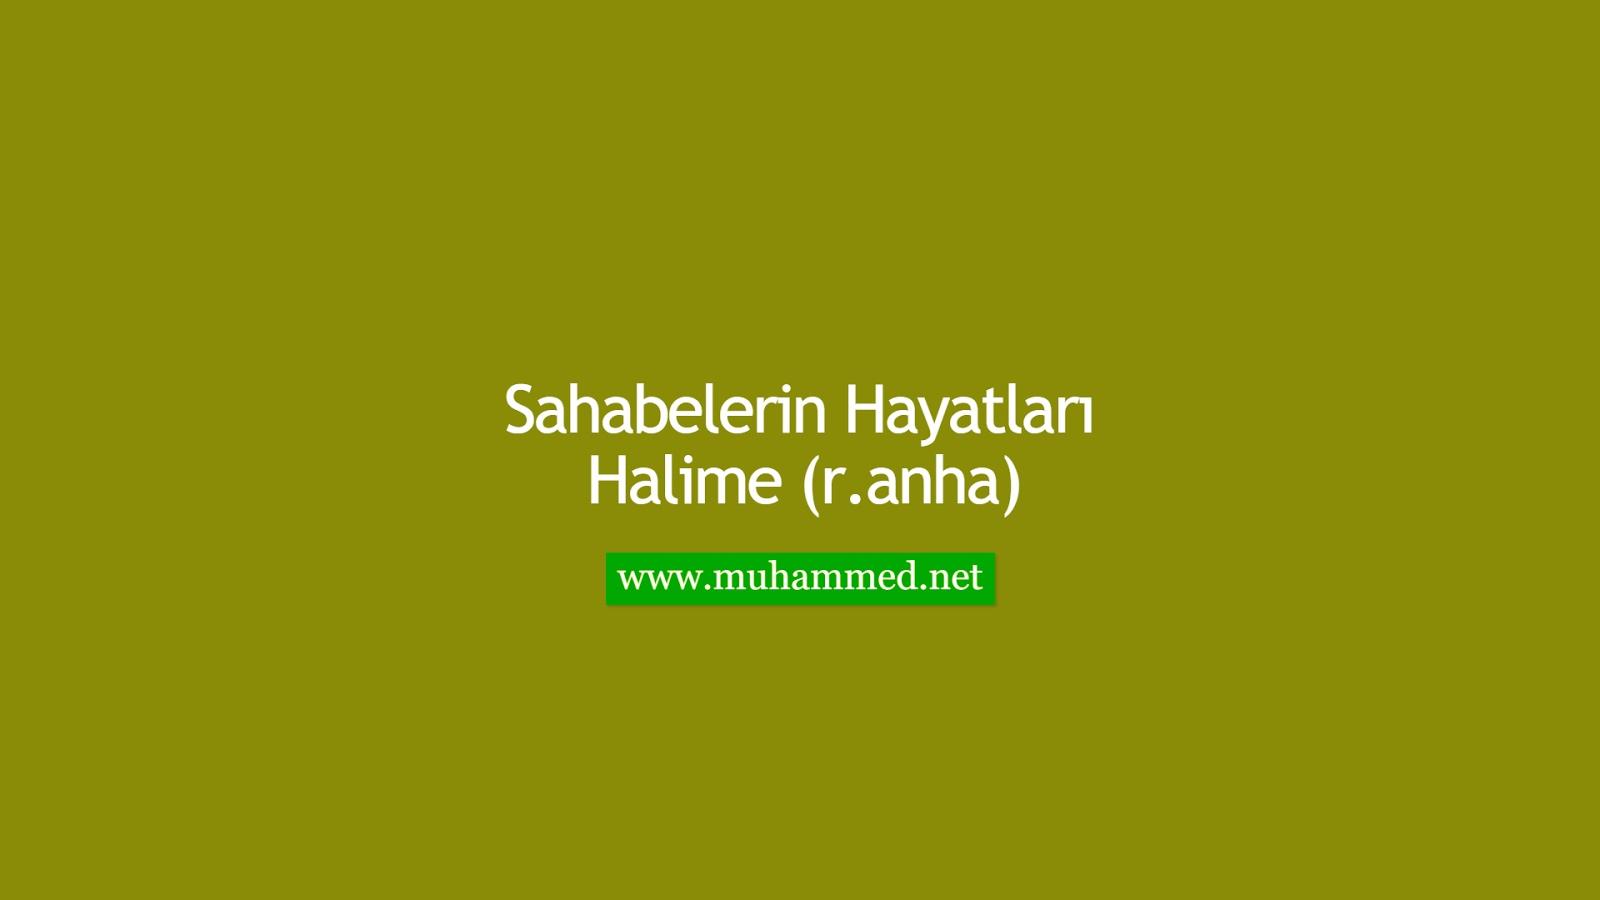 Halime (r.anha)